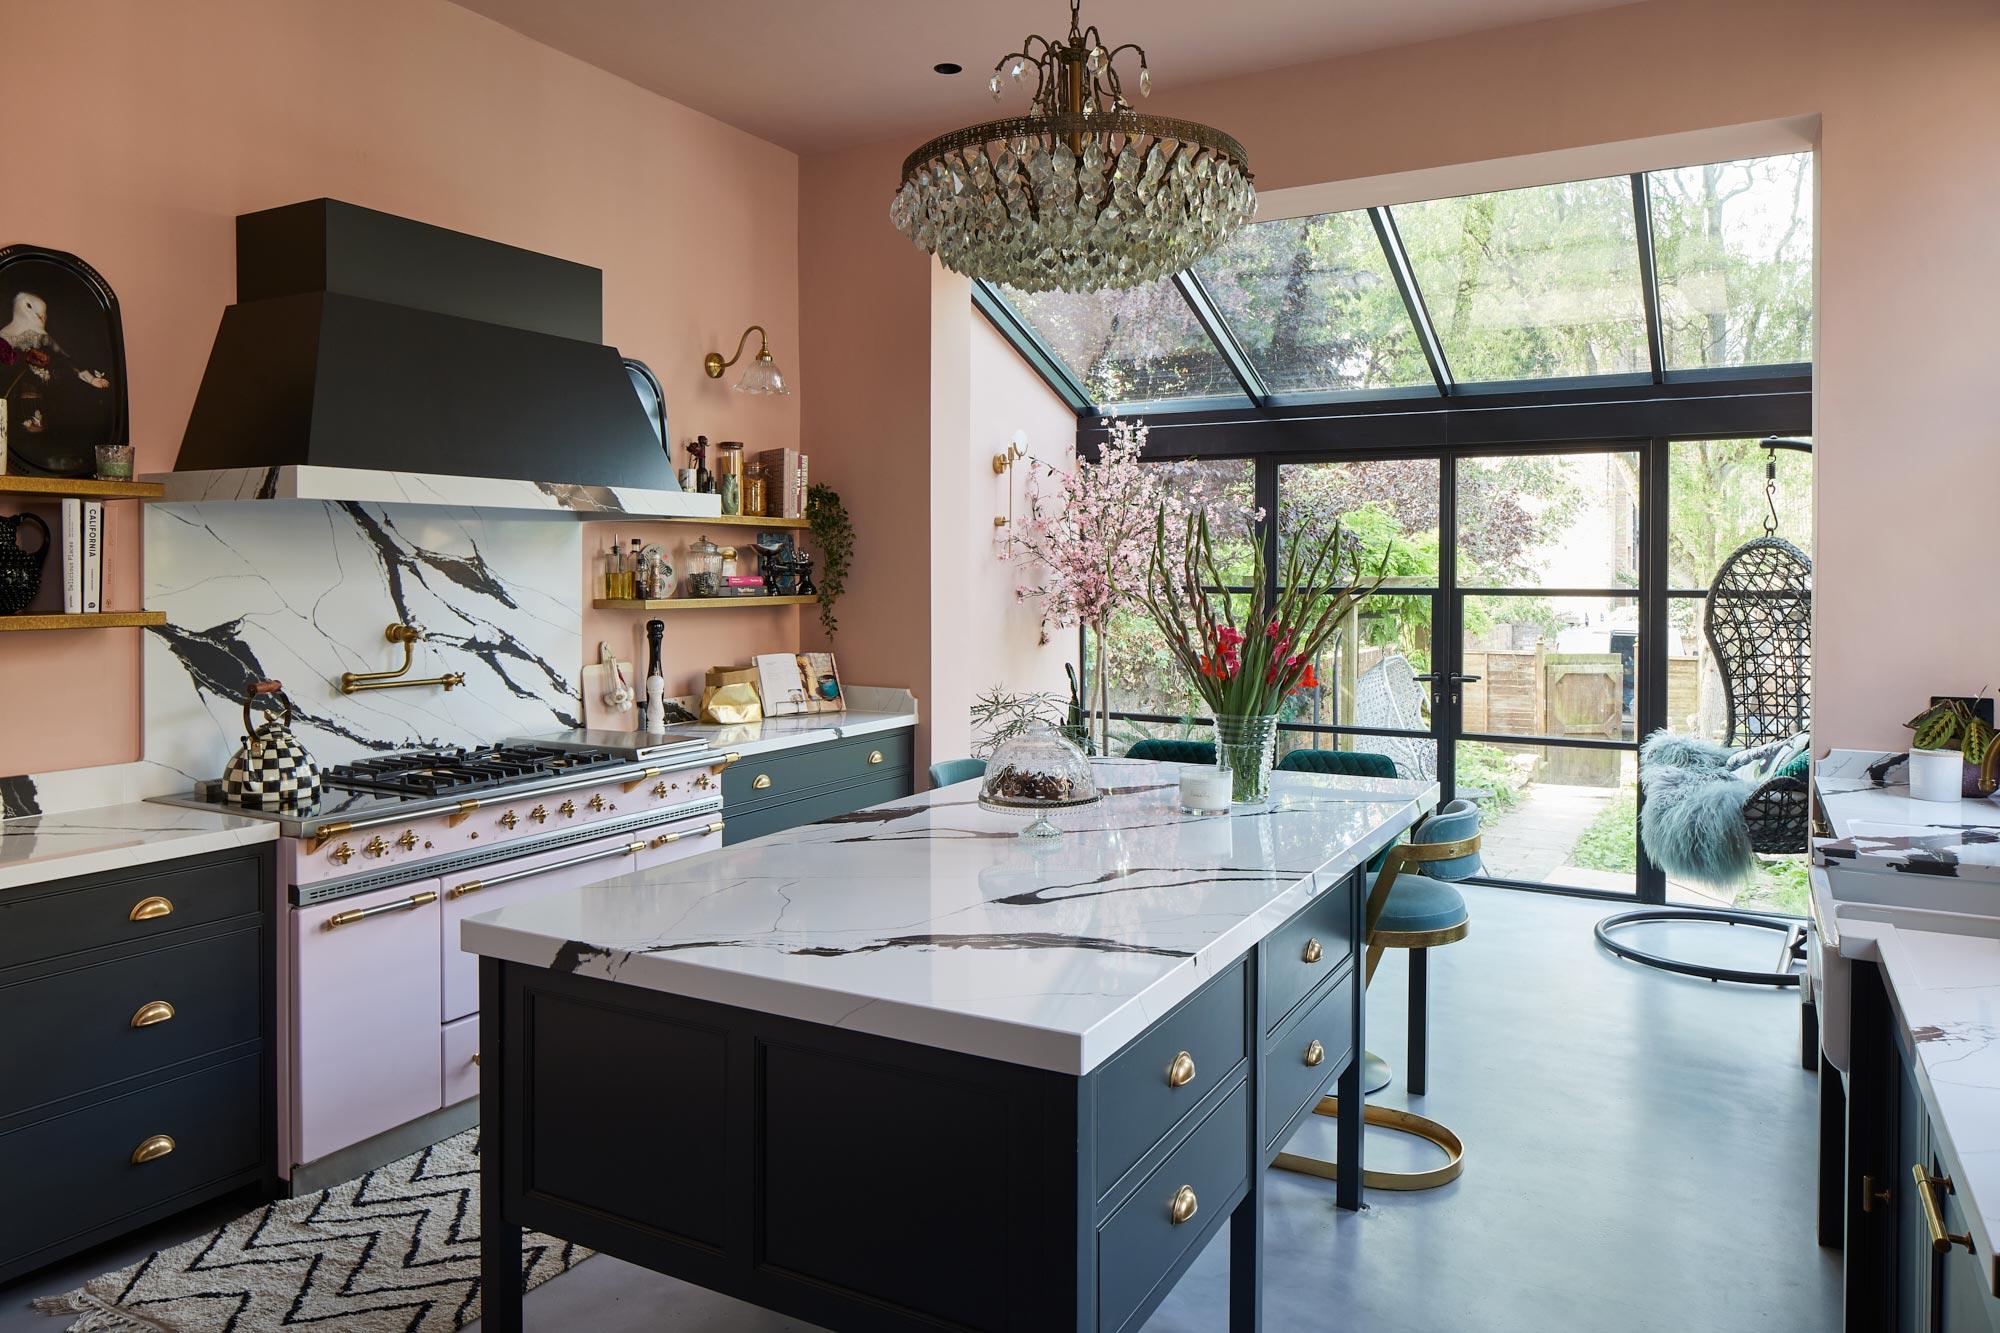 Bespoke bohemian style kitchen